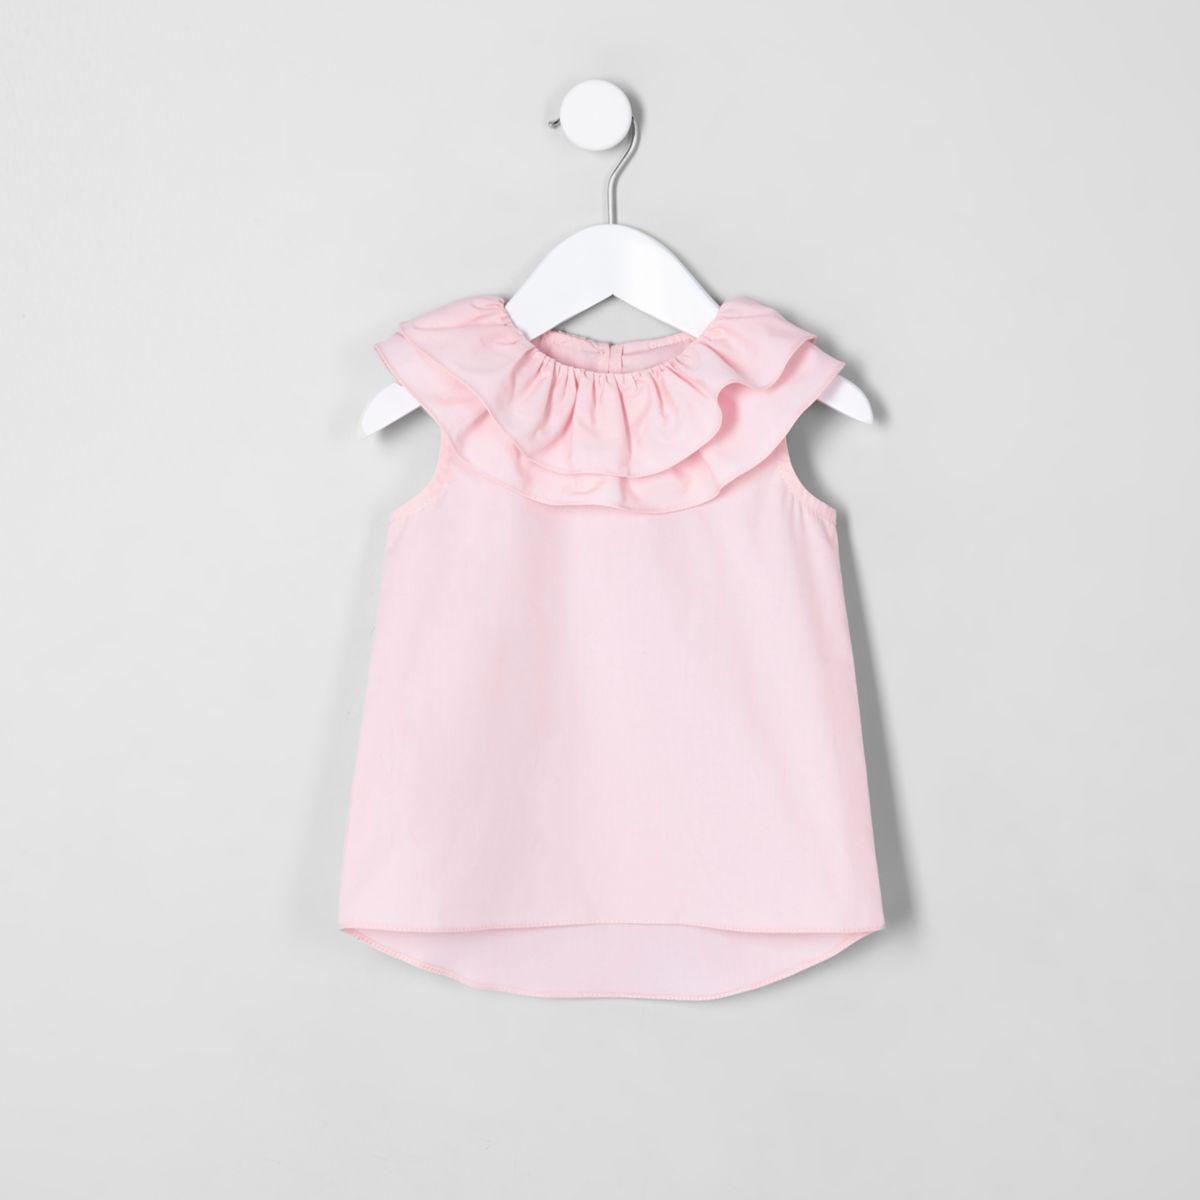 Mini girls pink clown collar sleeveless top